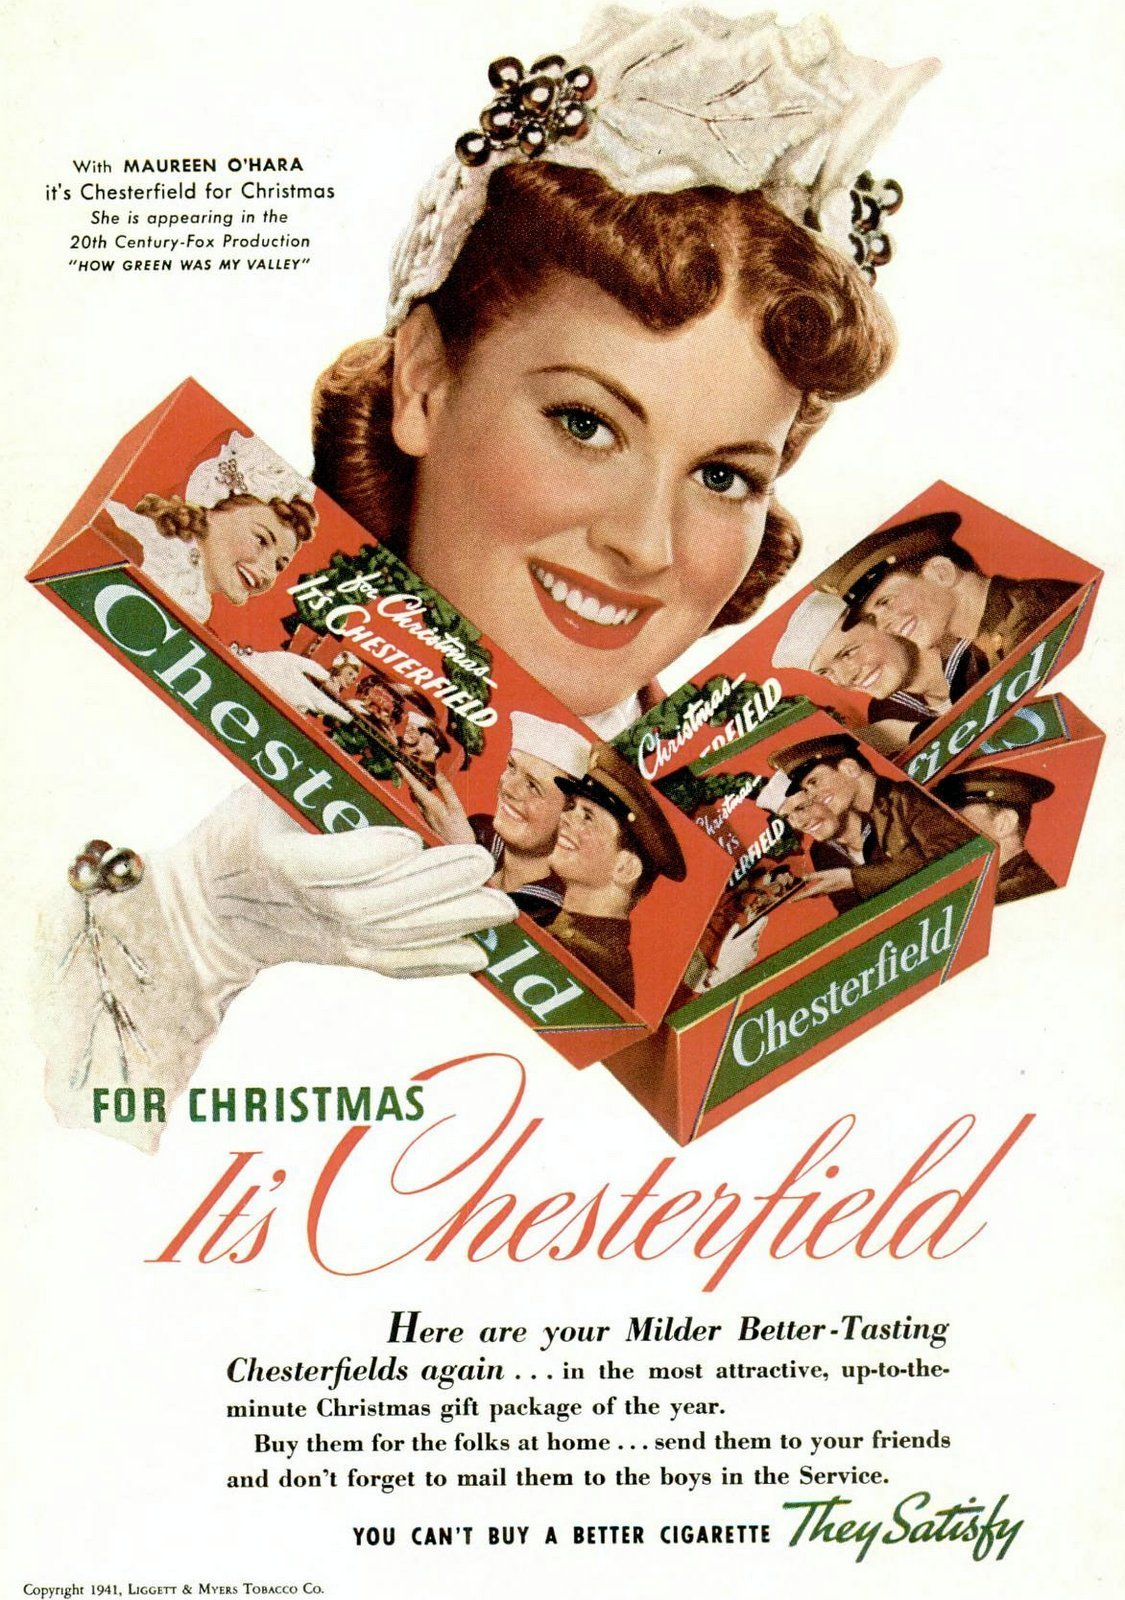 Dec 1941 Maureen O'Hara Chesterfield cigarettes